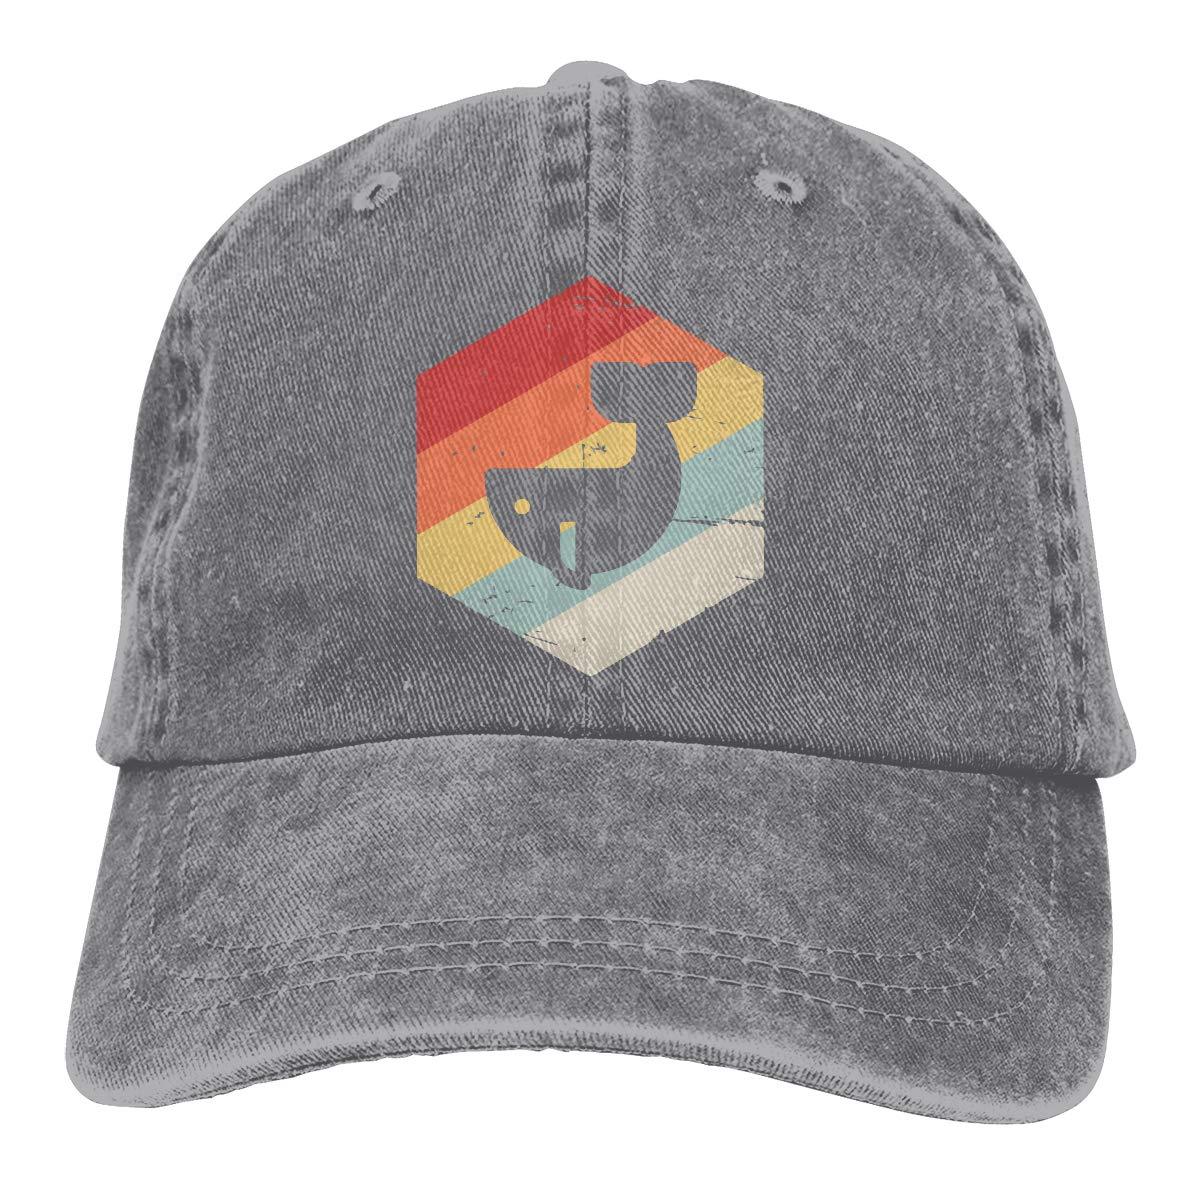 Men Women Classic Denim Fabric Baseball Cap Vintage Whale Trucker Cap